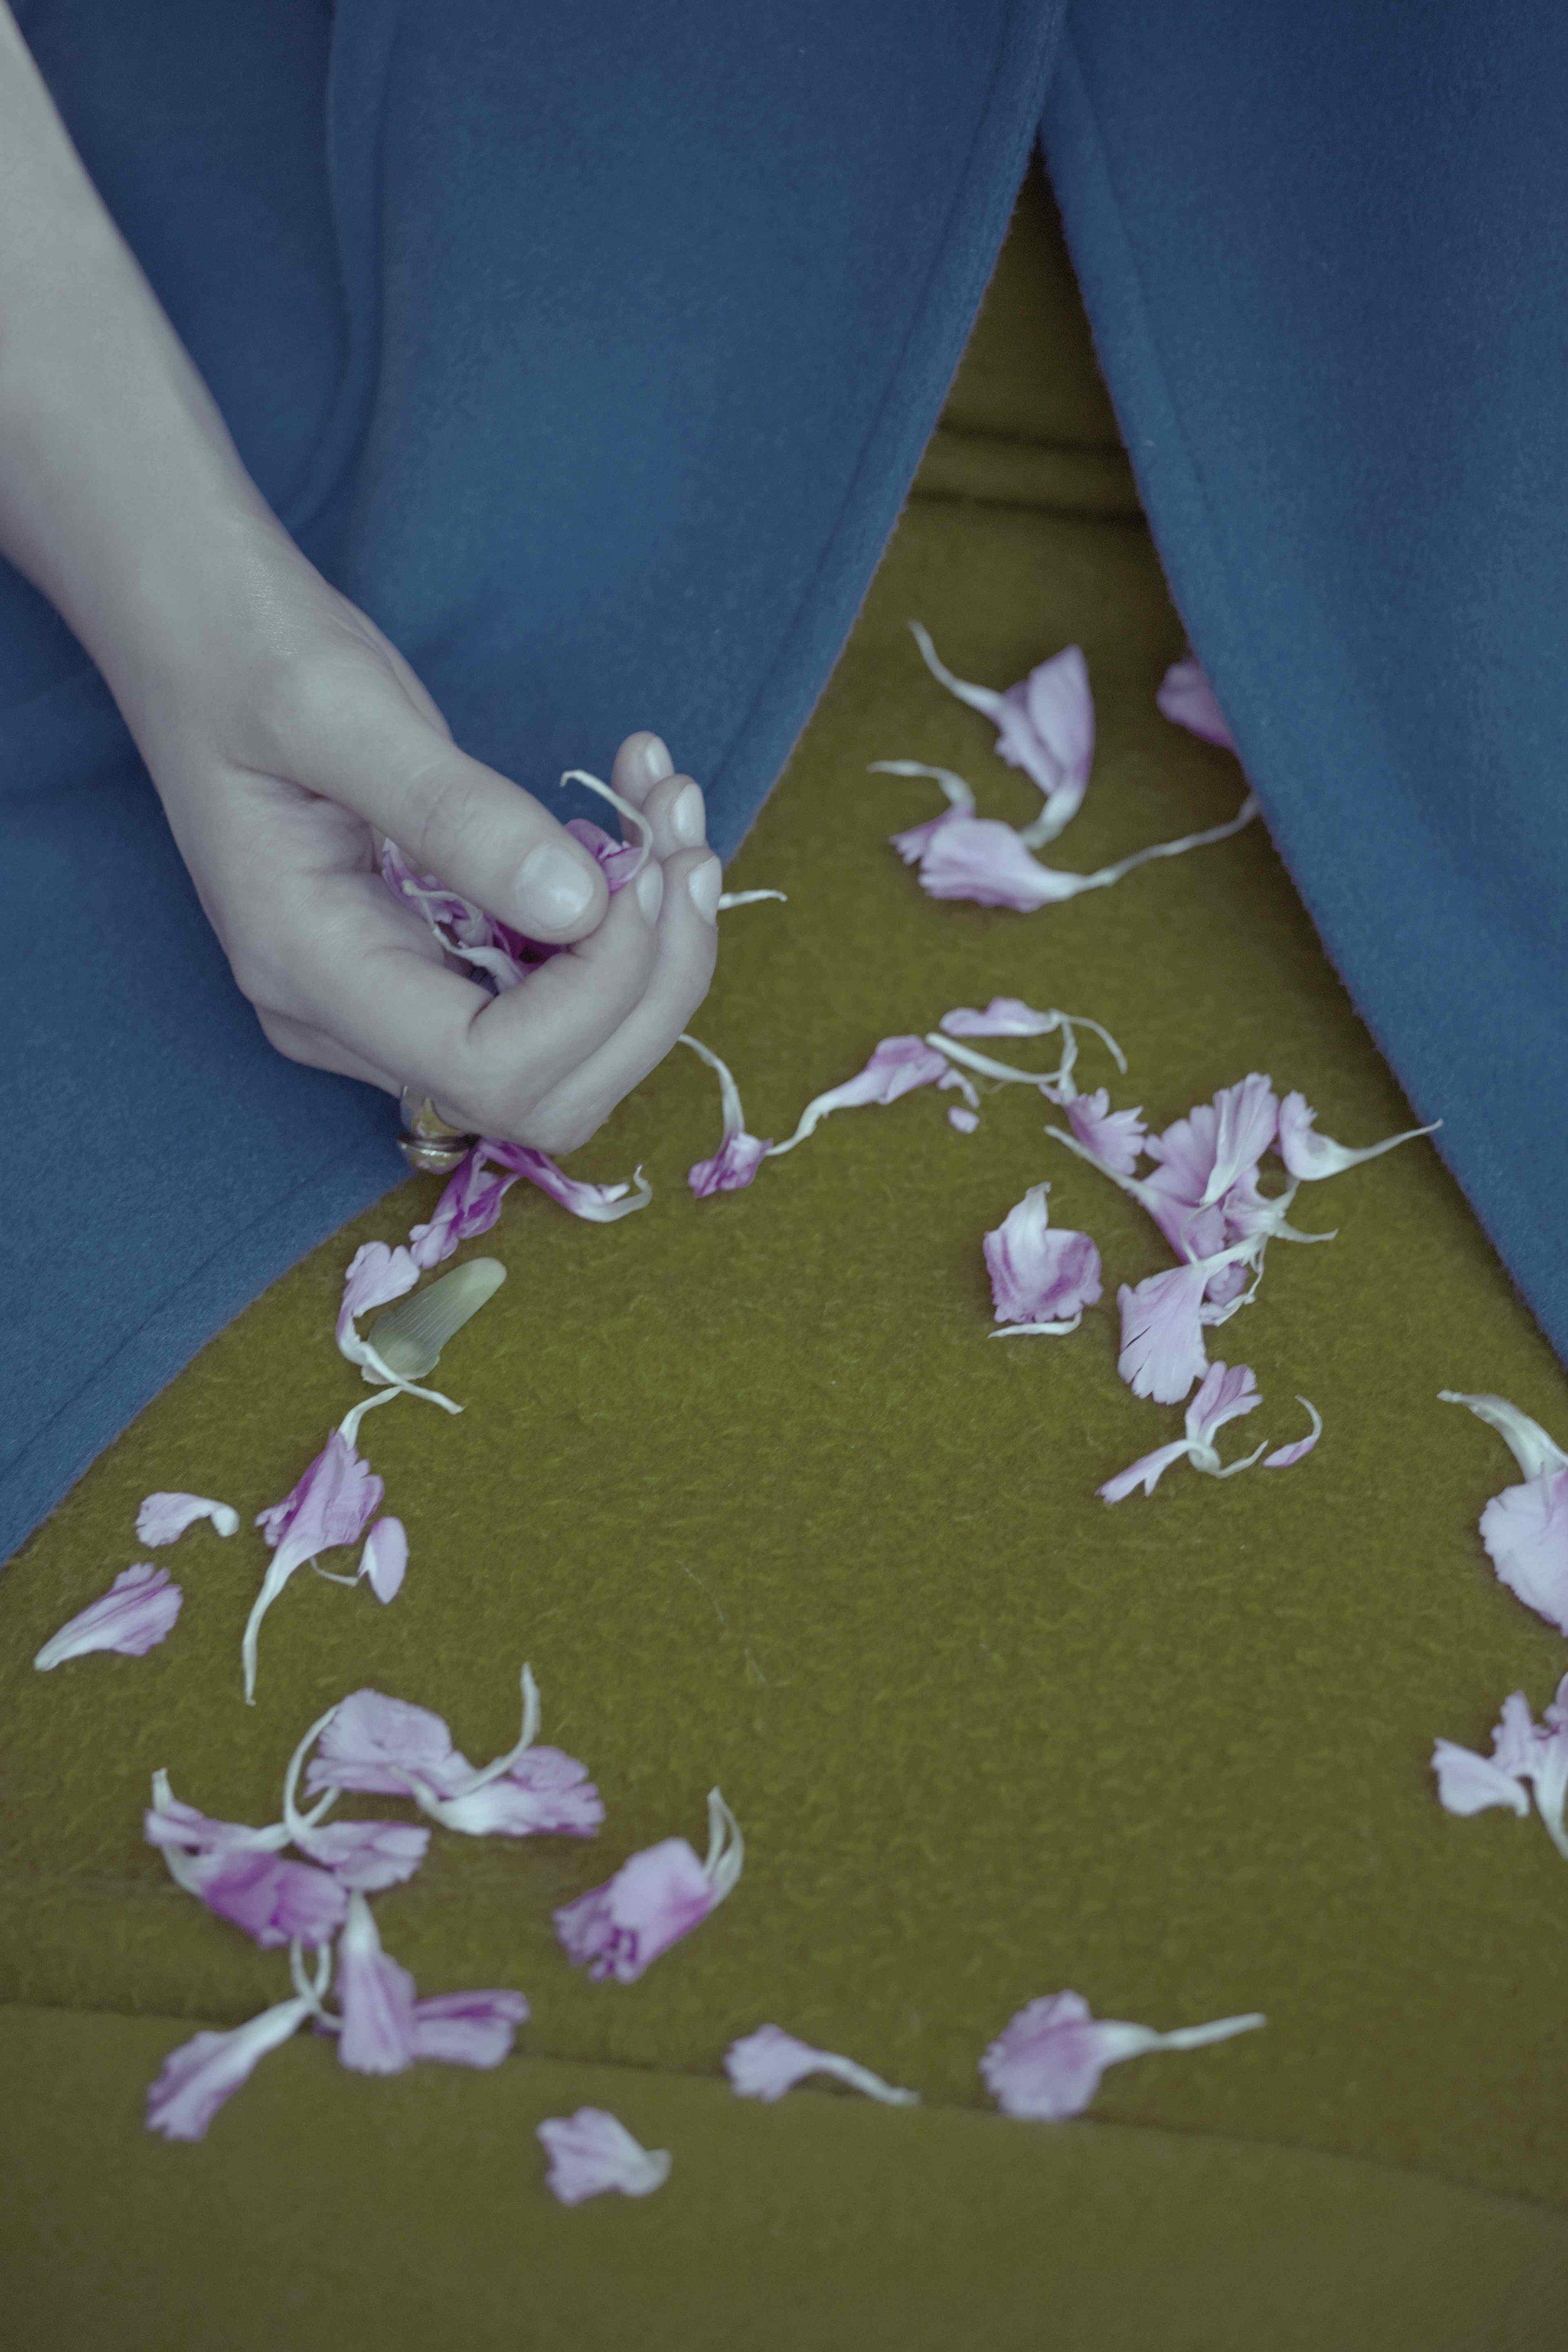 Teal coat by Jil Sander, skirt by Rochas